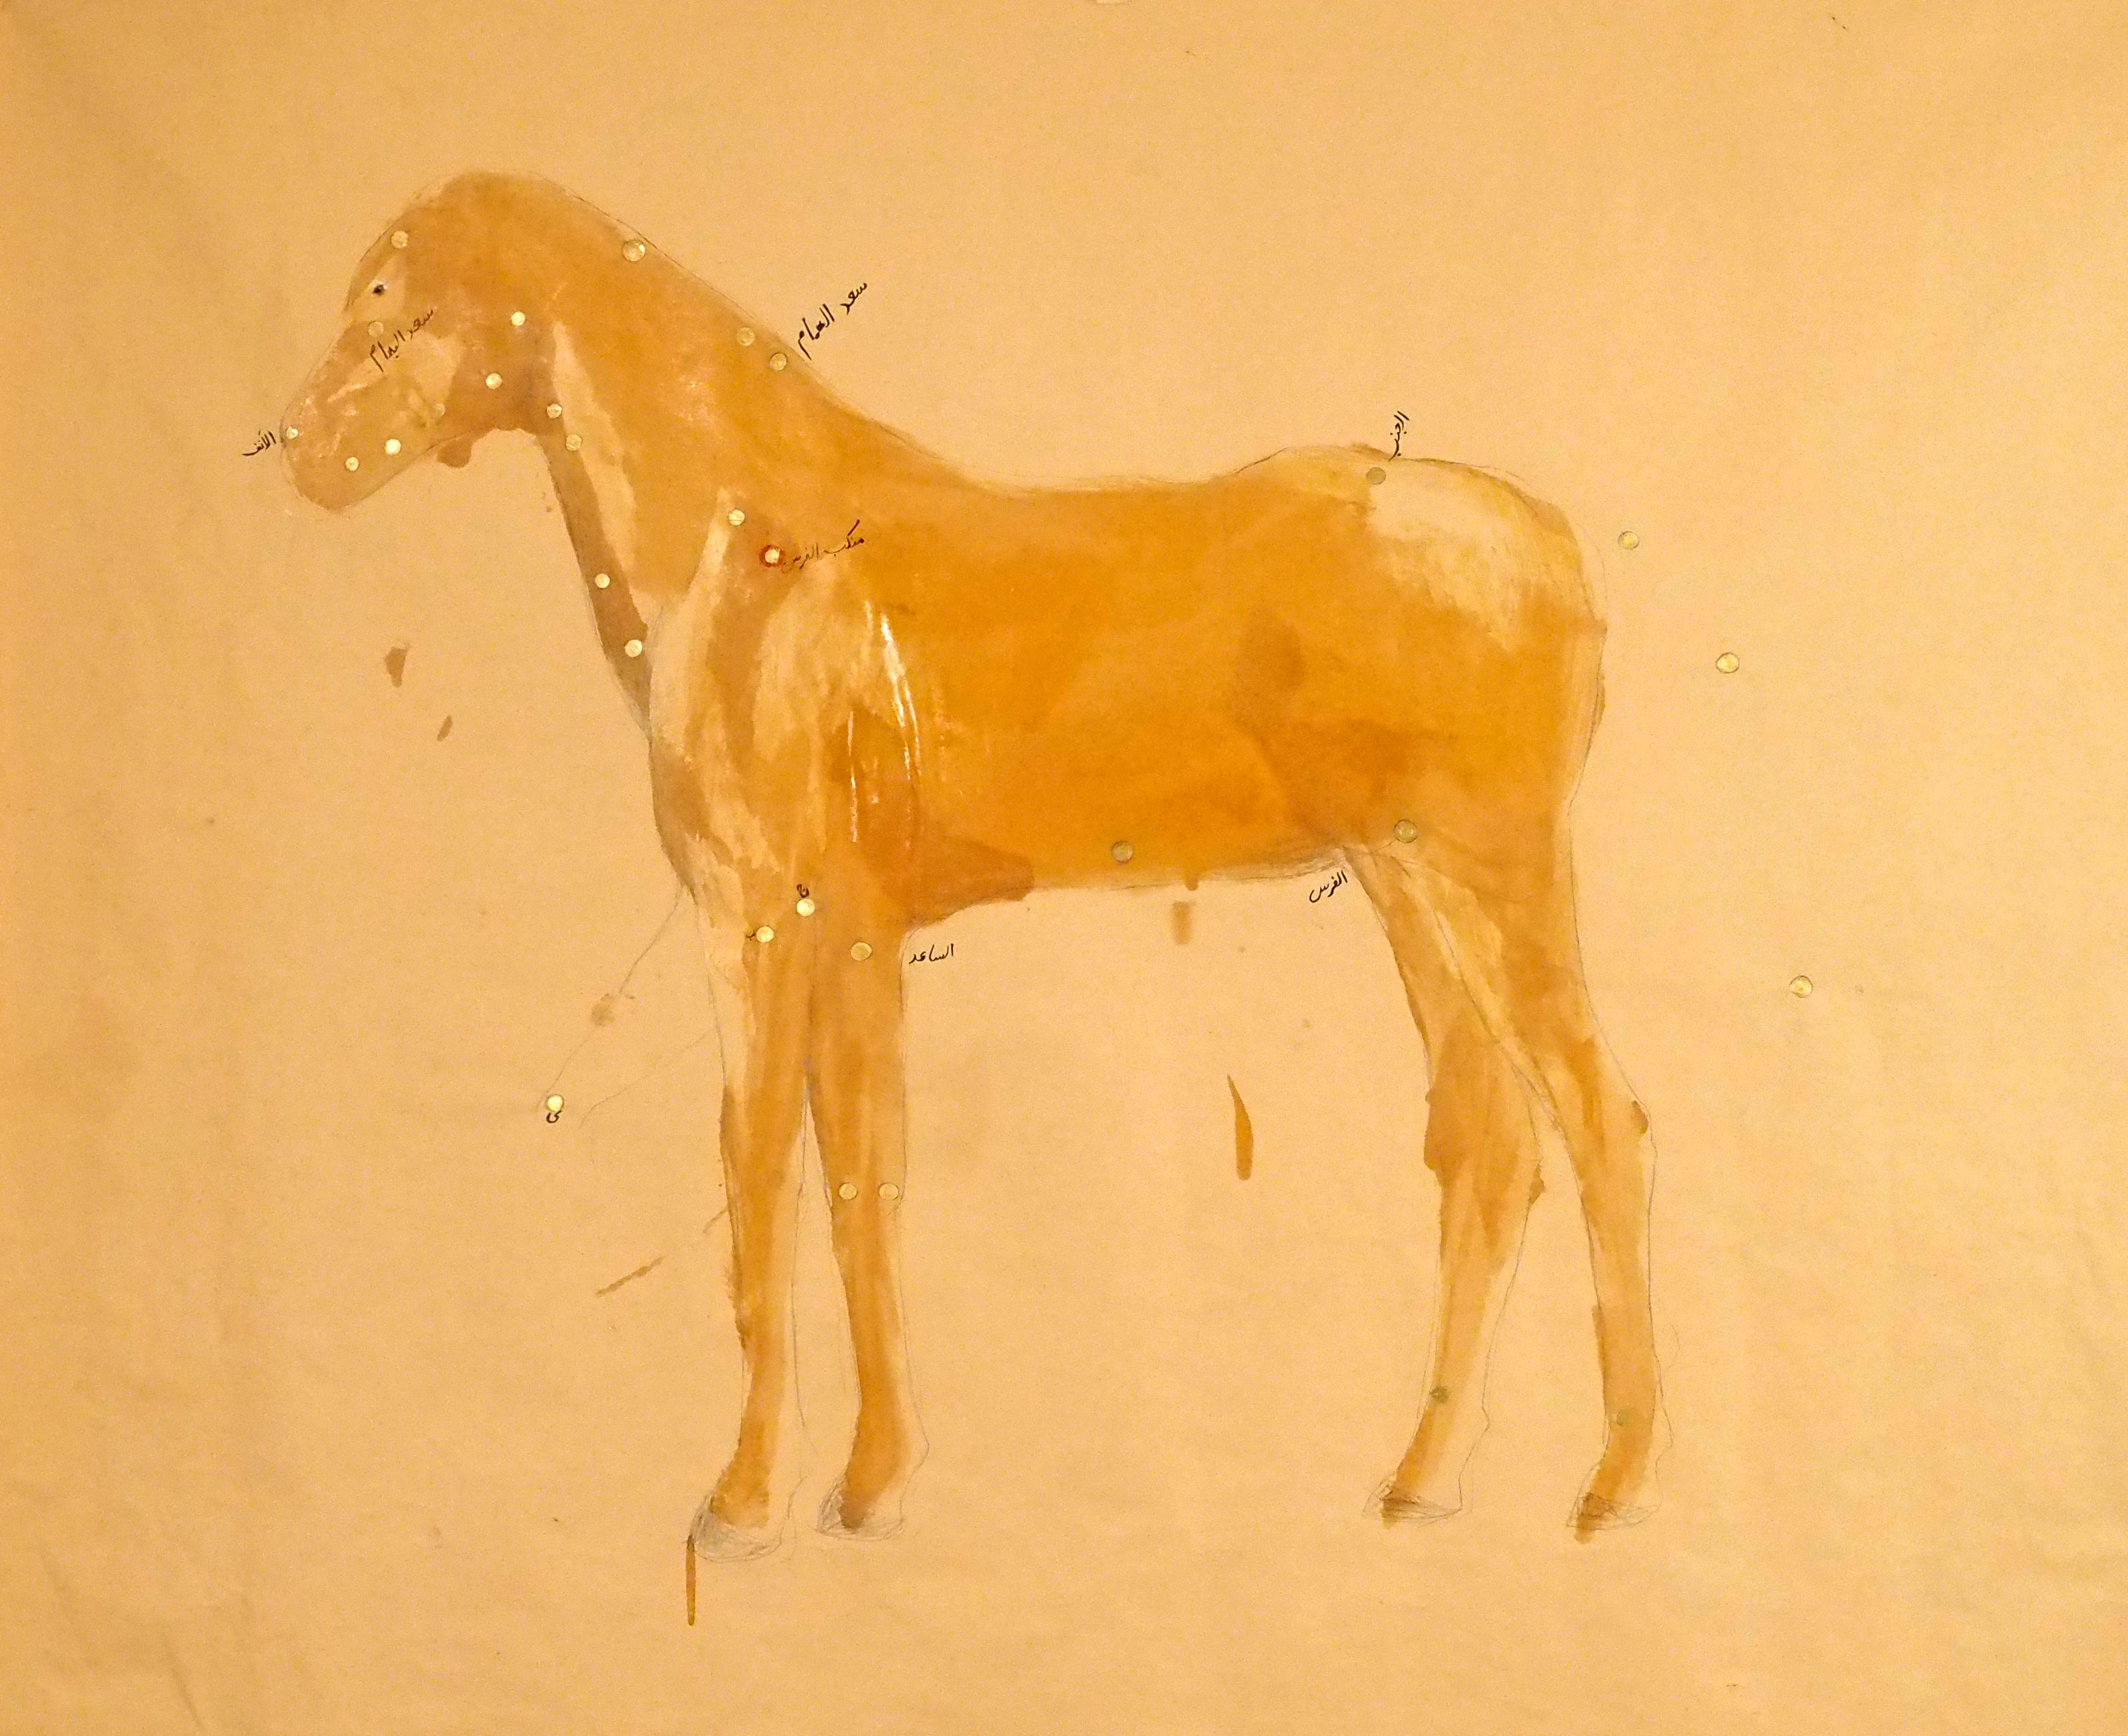 Avish Khebrehzadeh, Imaginary Fixed Stars 3 (Pegasus), 1996-2014, resina su carta, 54x68,5 pollici